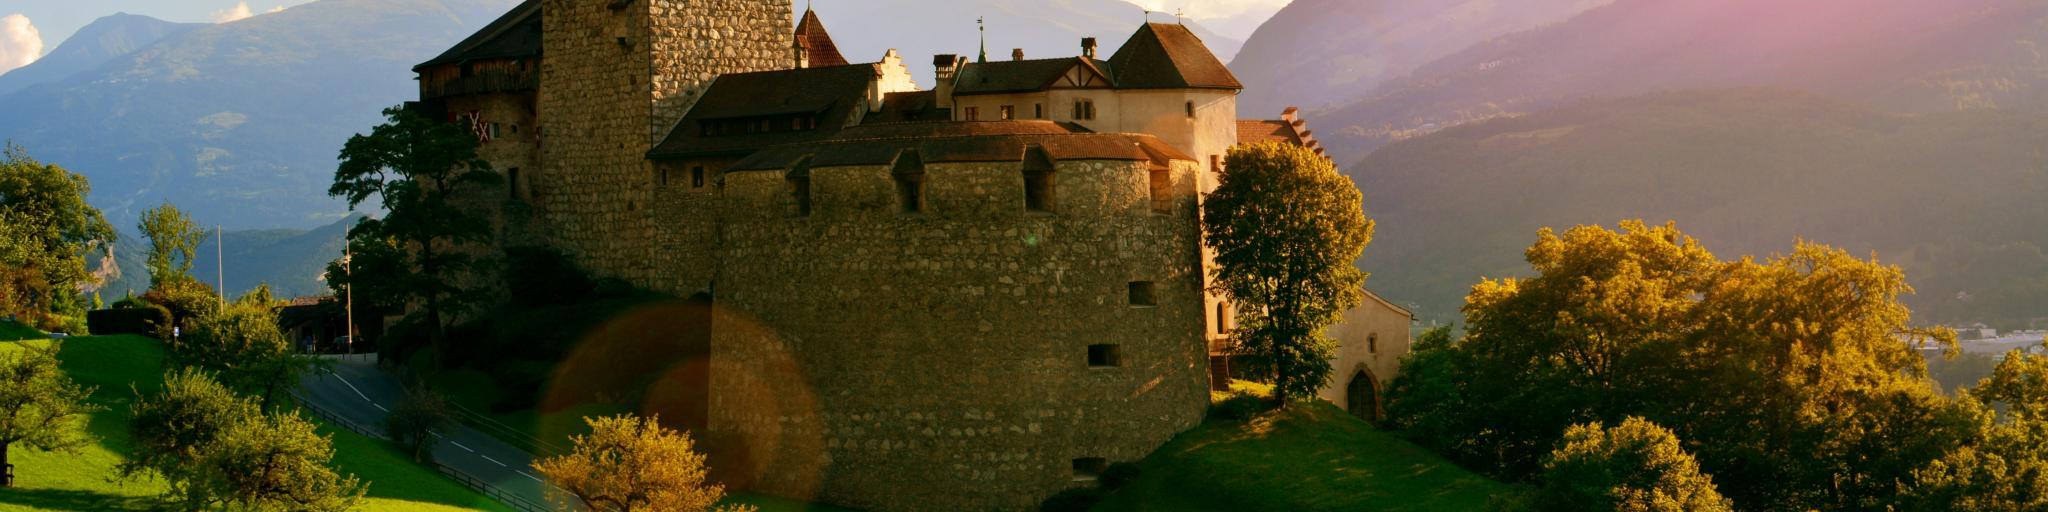 Vaduz Castle perched on a sunny hilltop in Liechtenstein's capital city